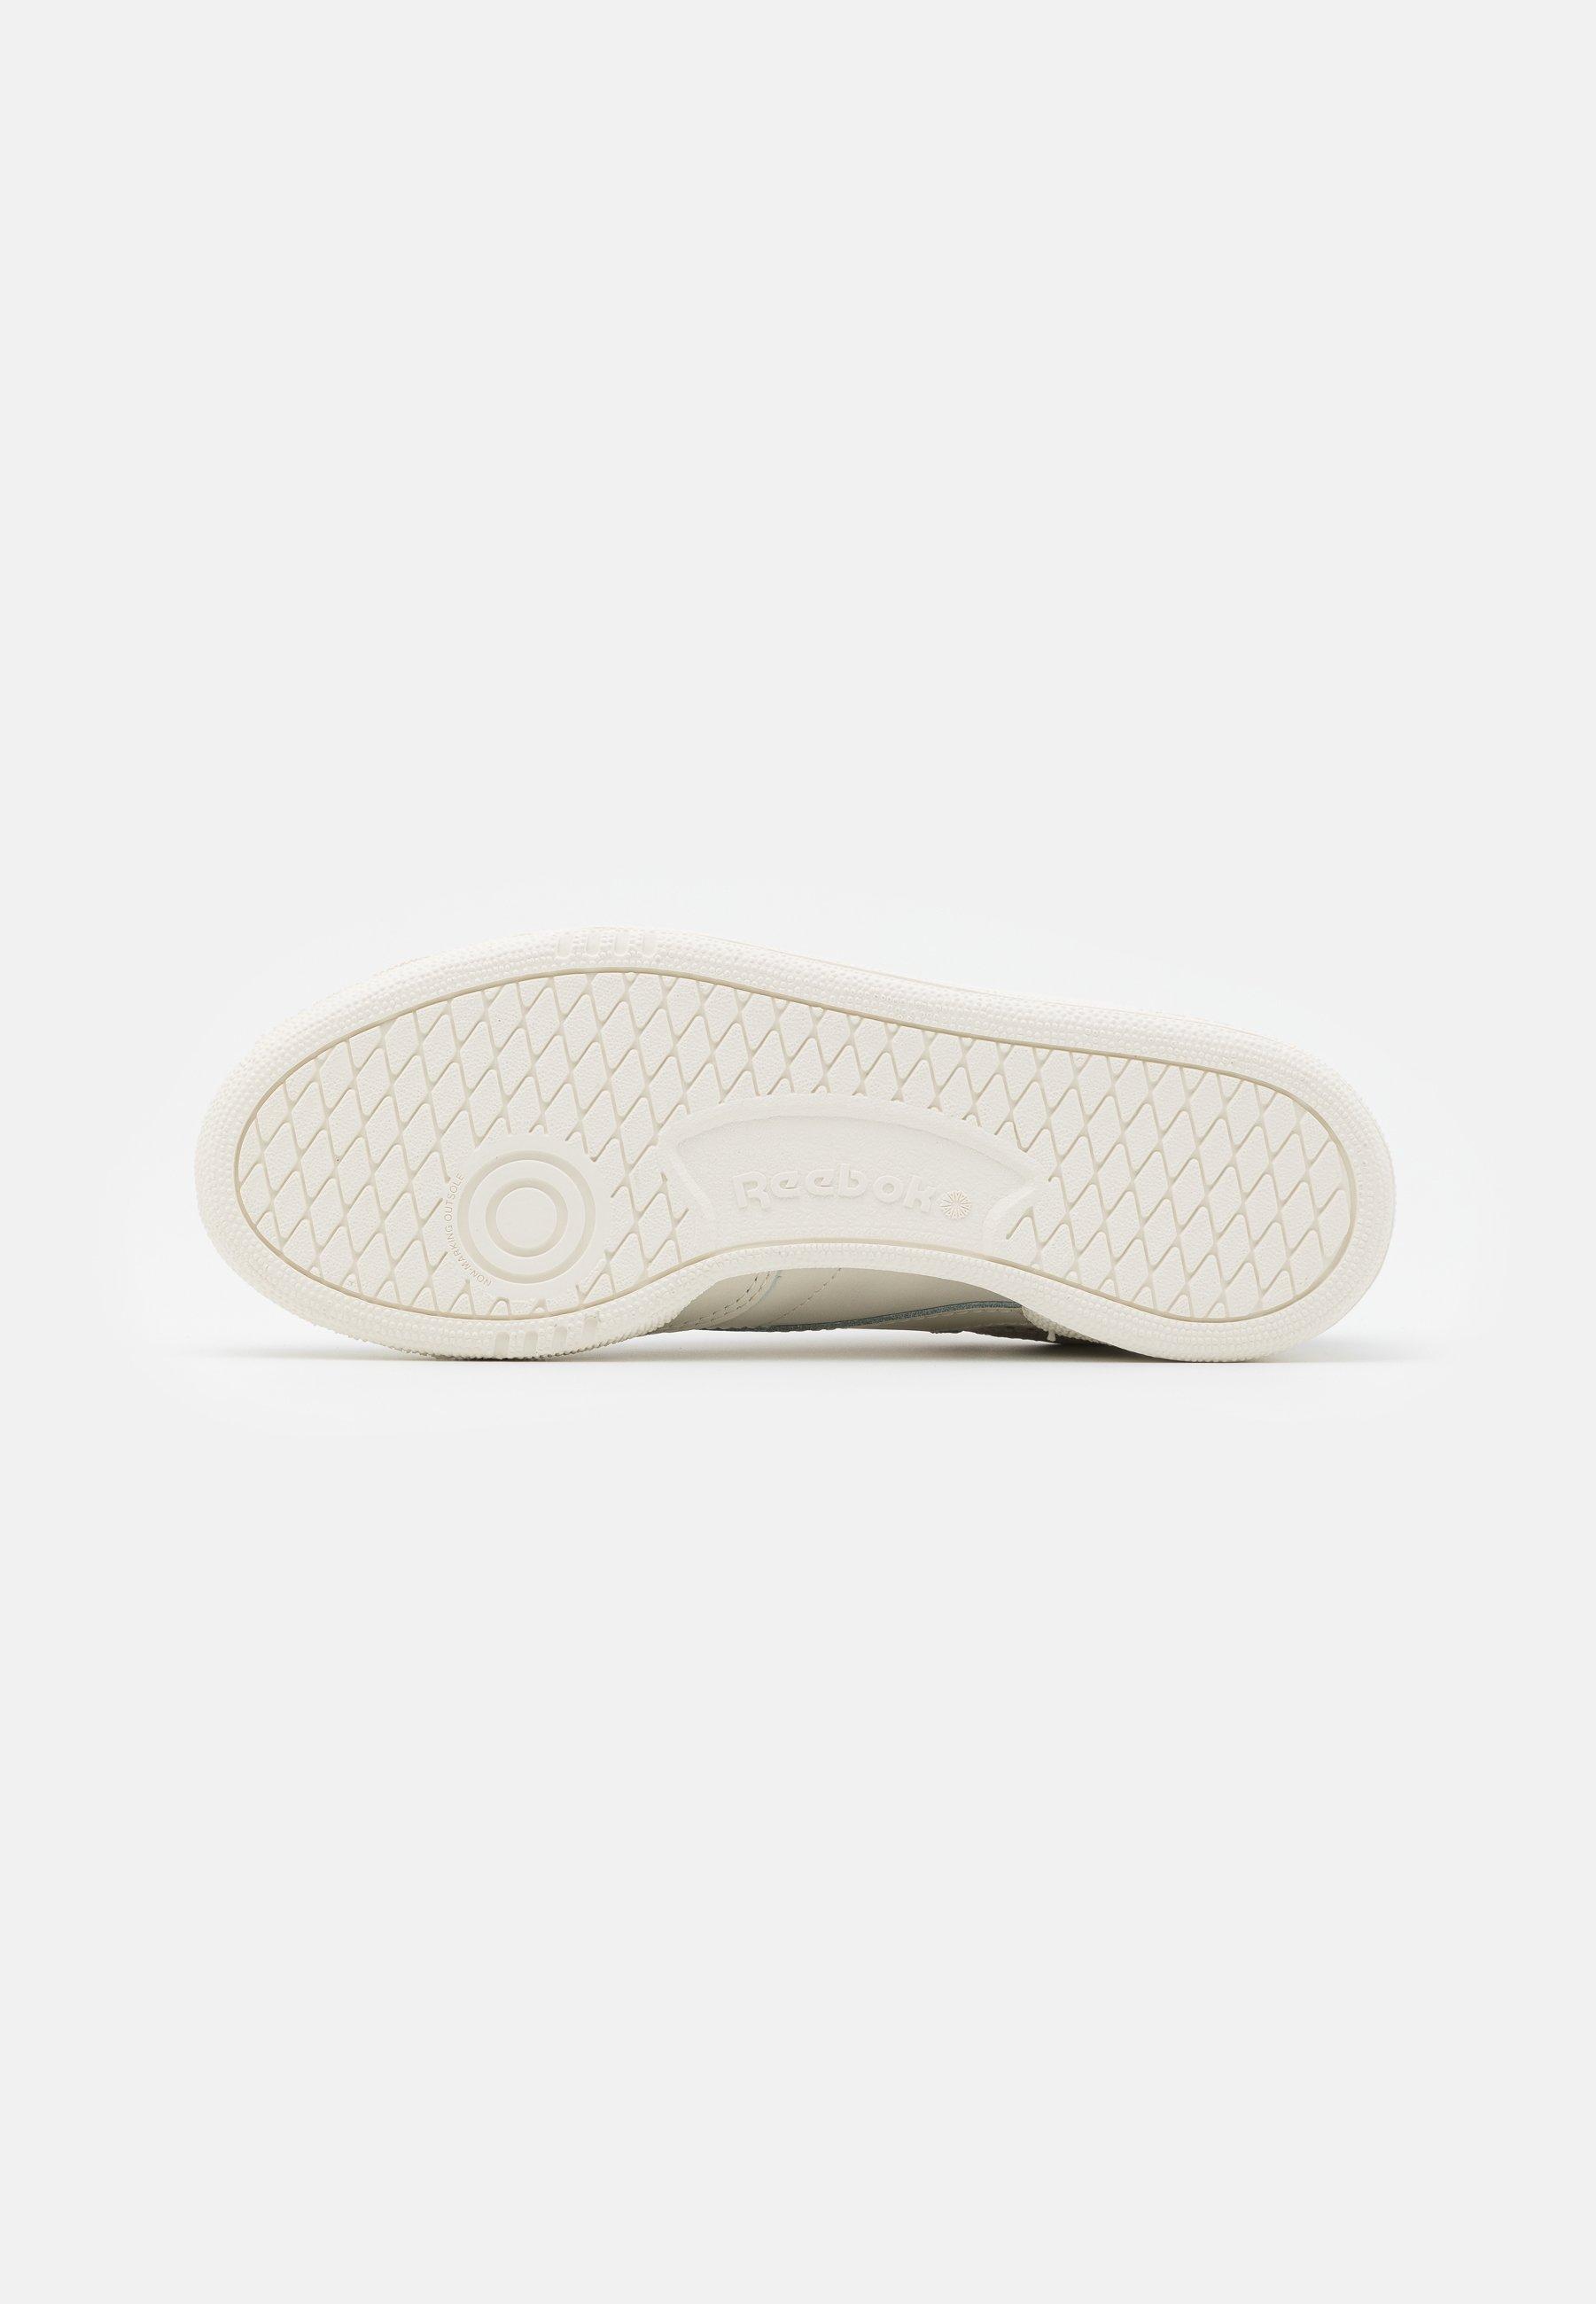 2020 New Get Online Women's Shoes Reebok Classic CLUB C 85 Trainers alabaster/maroon/chalk tYfCCechX G3WFy0cc7